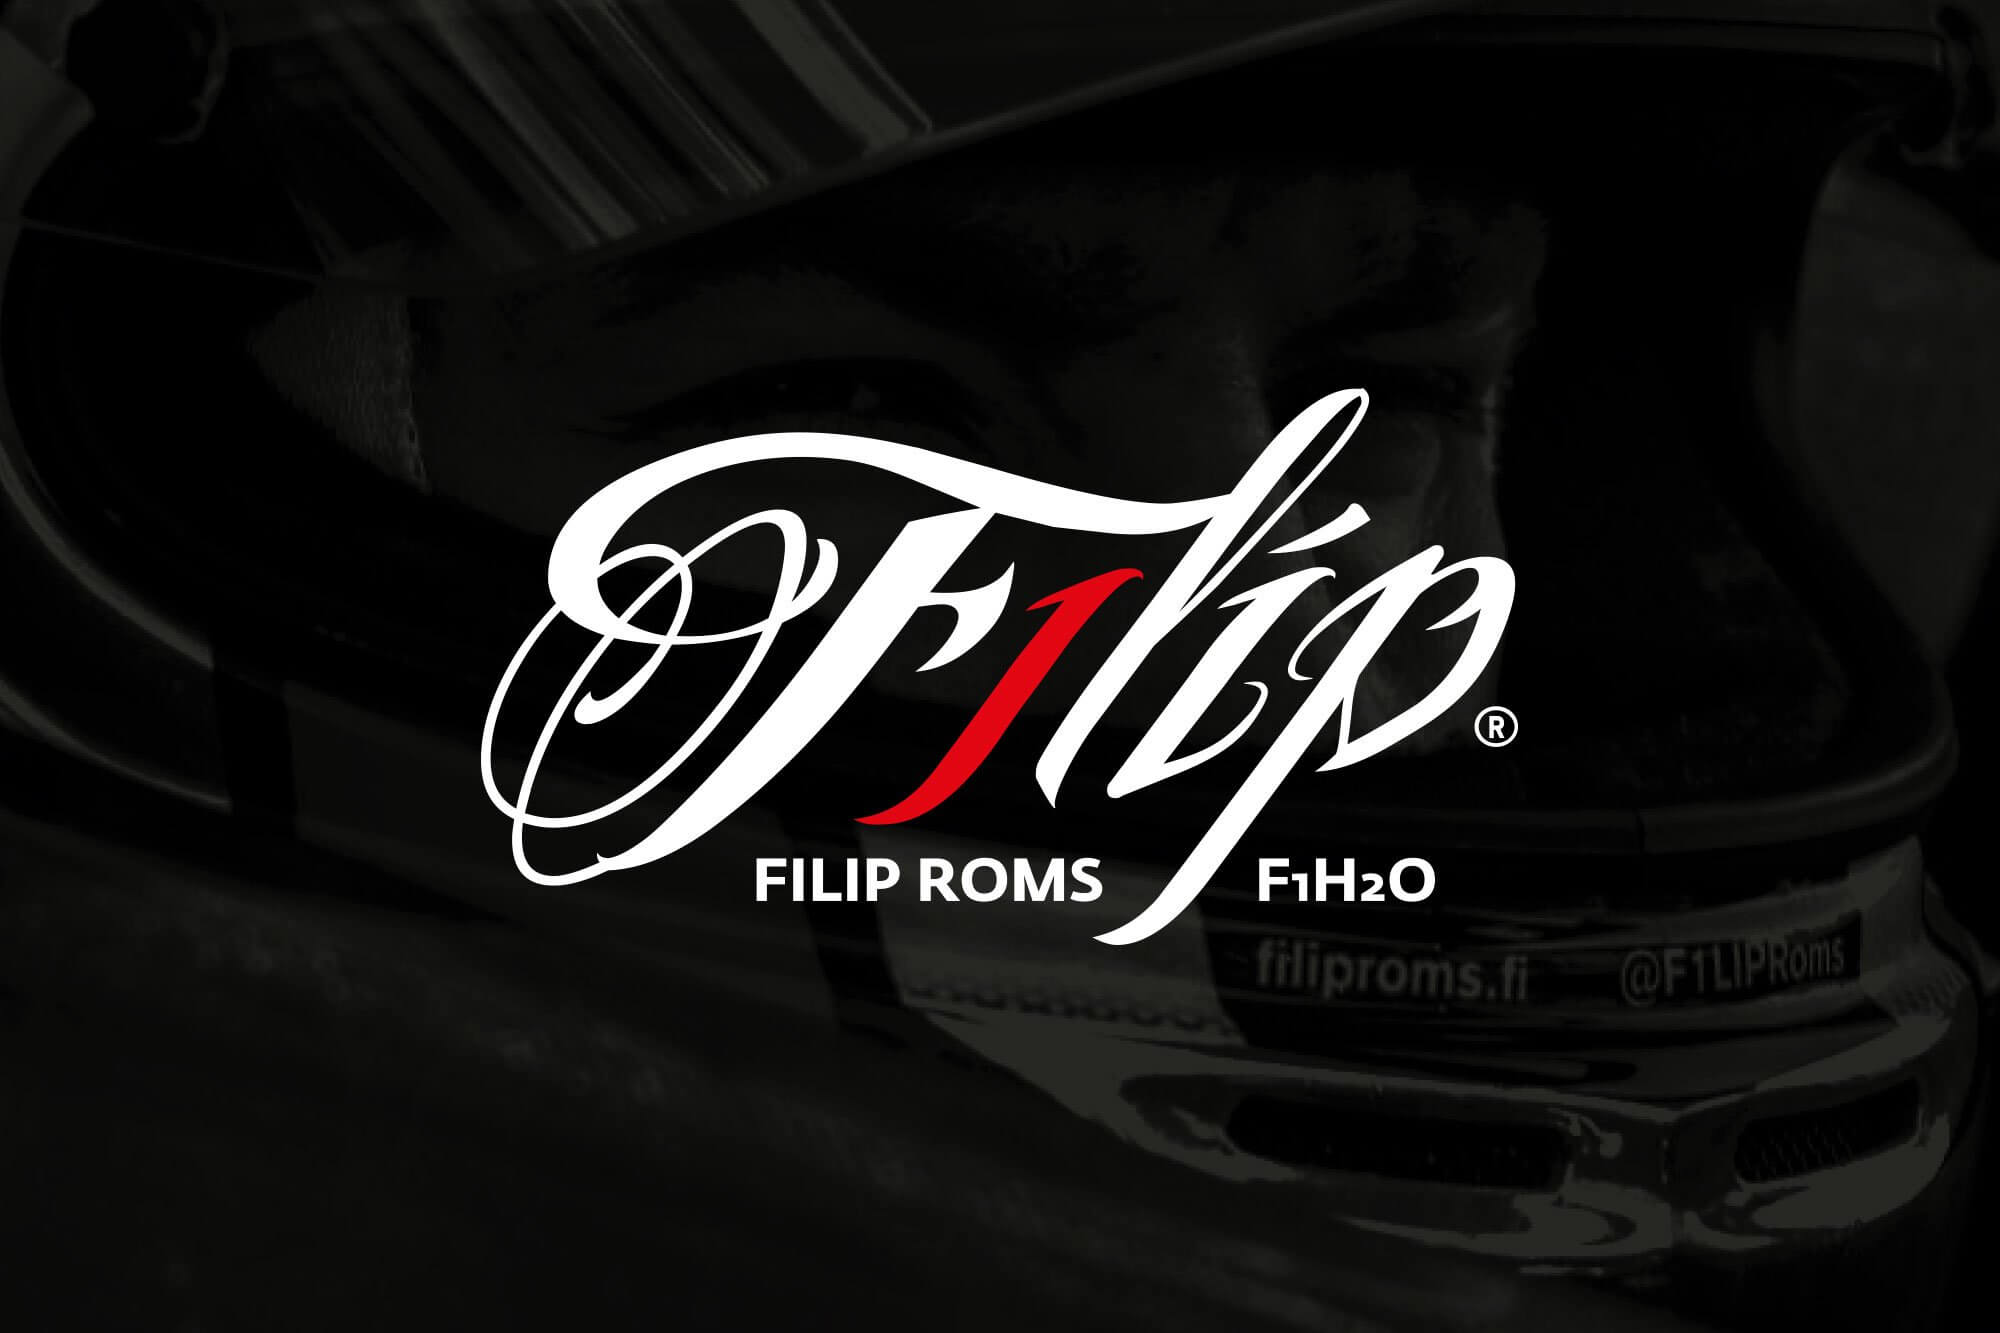 Filip F1H2O -logo